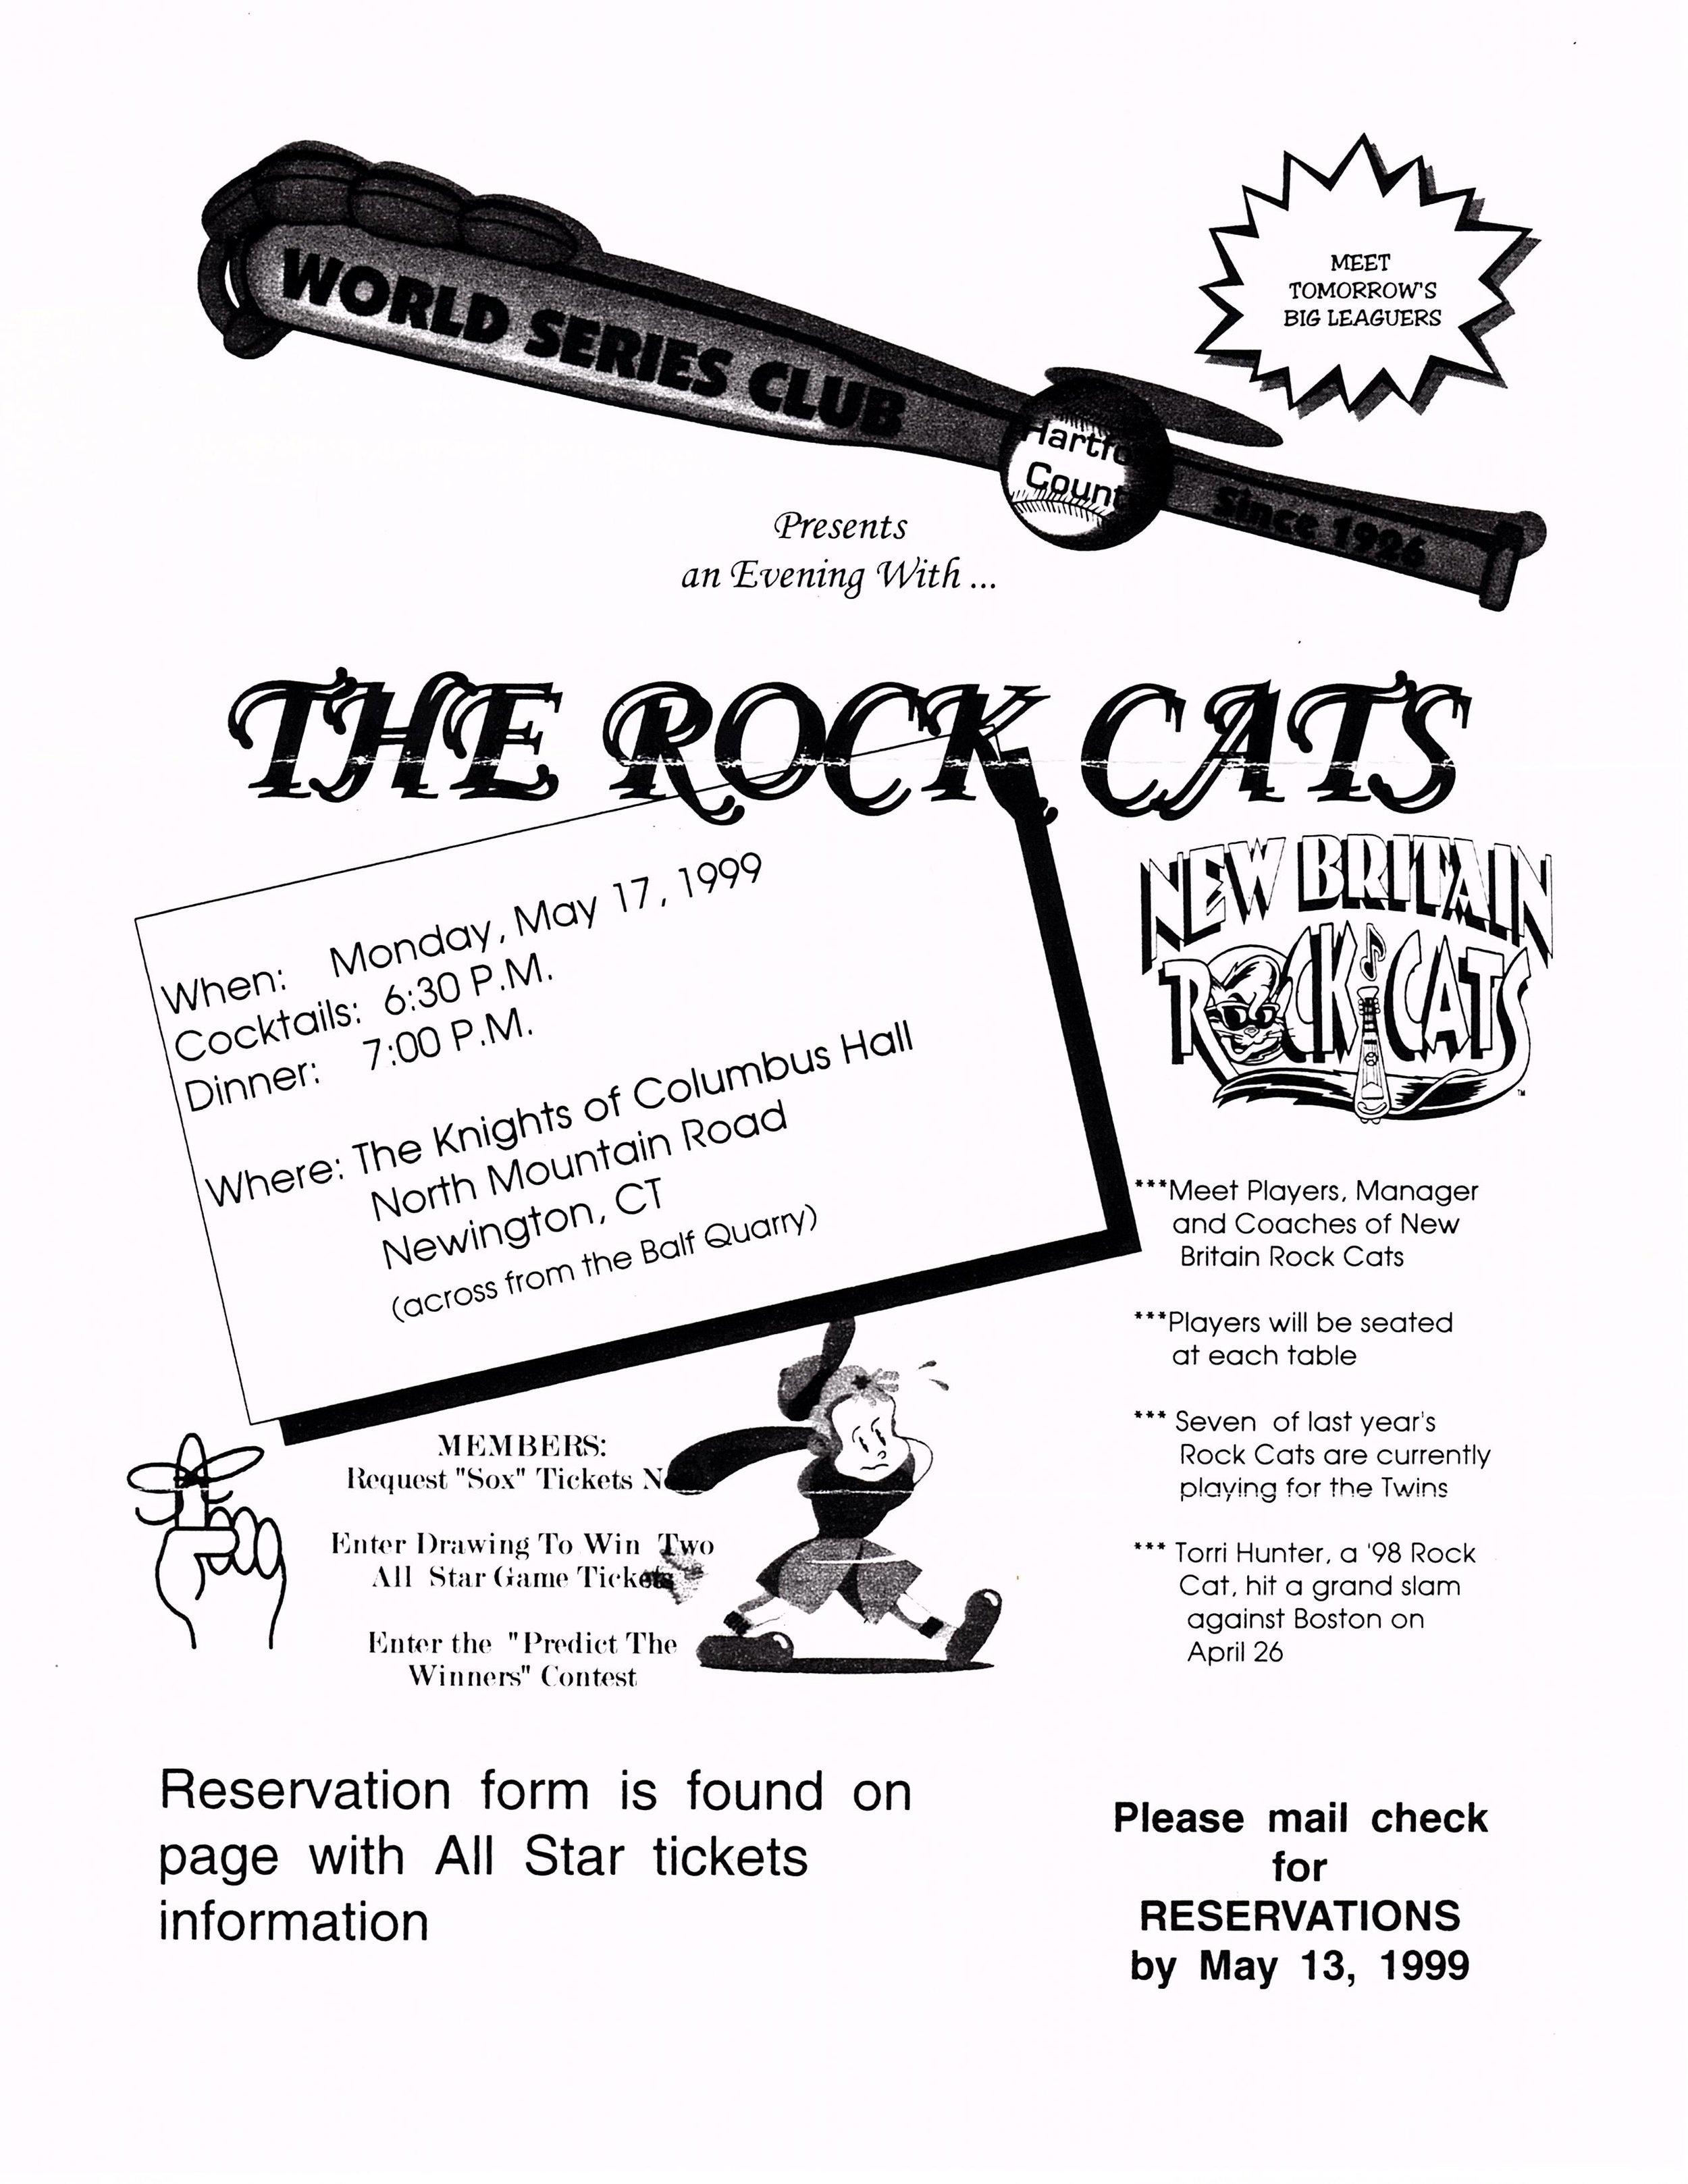 19990517 New Britain Rock Cats.jpg